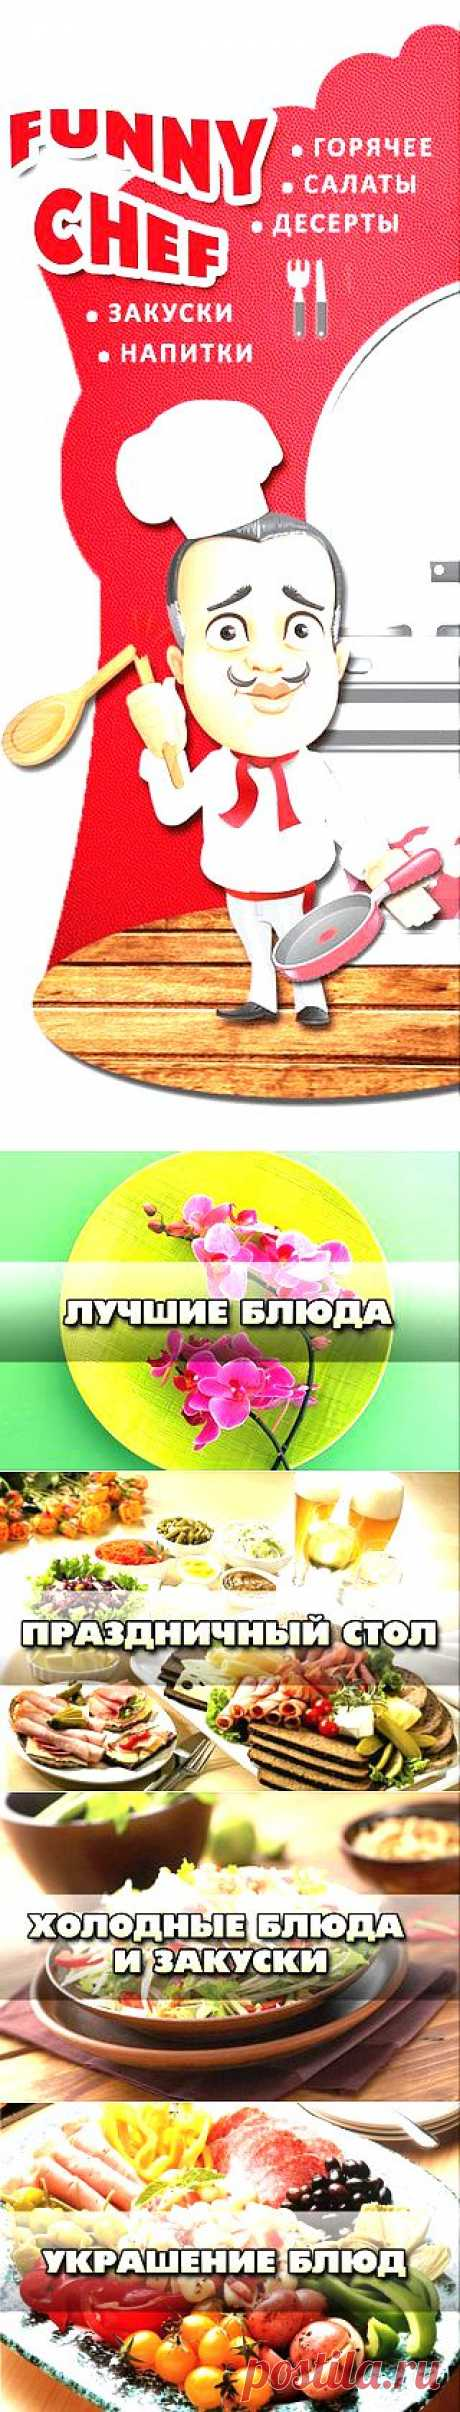 Funny Chef • Рецепты